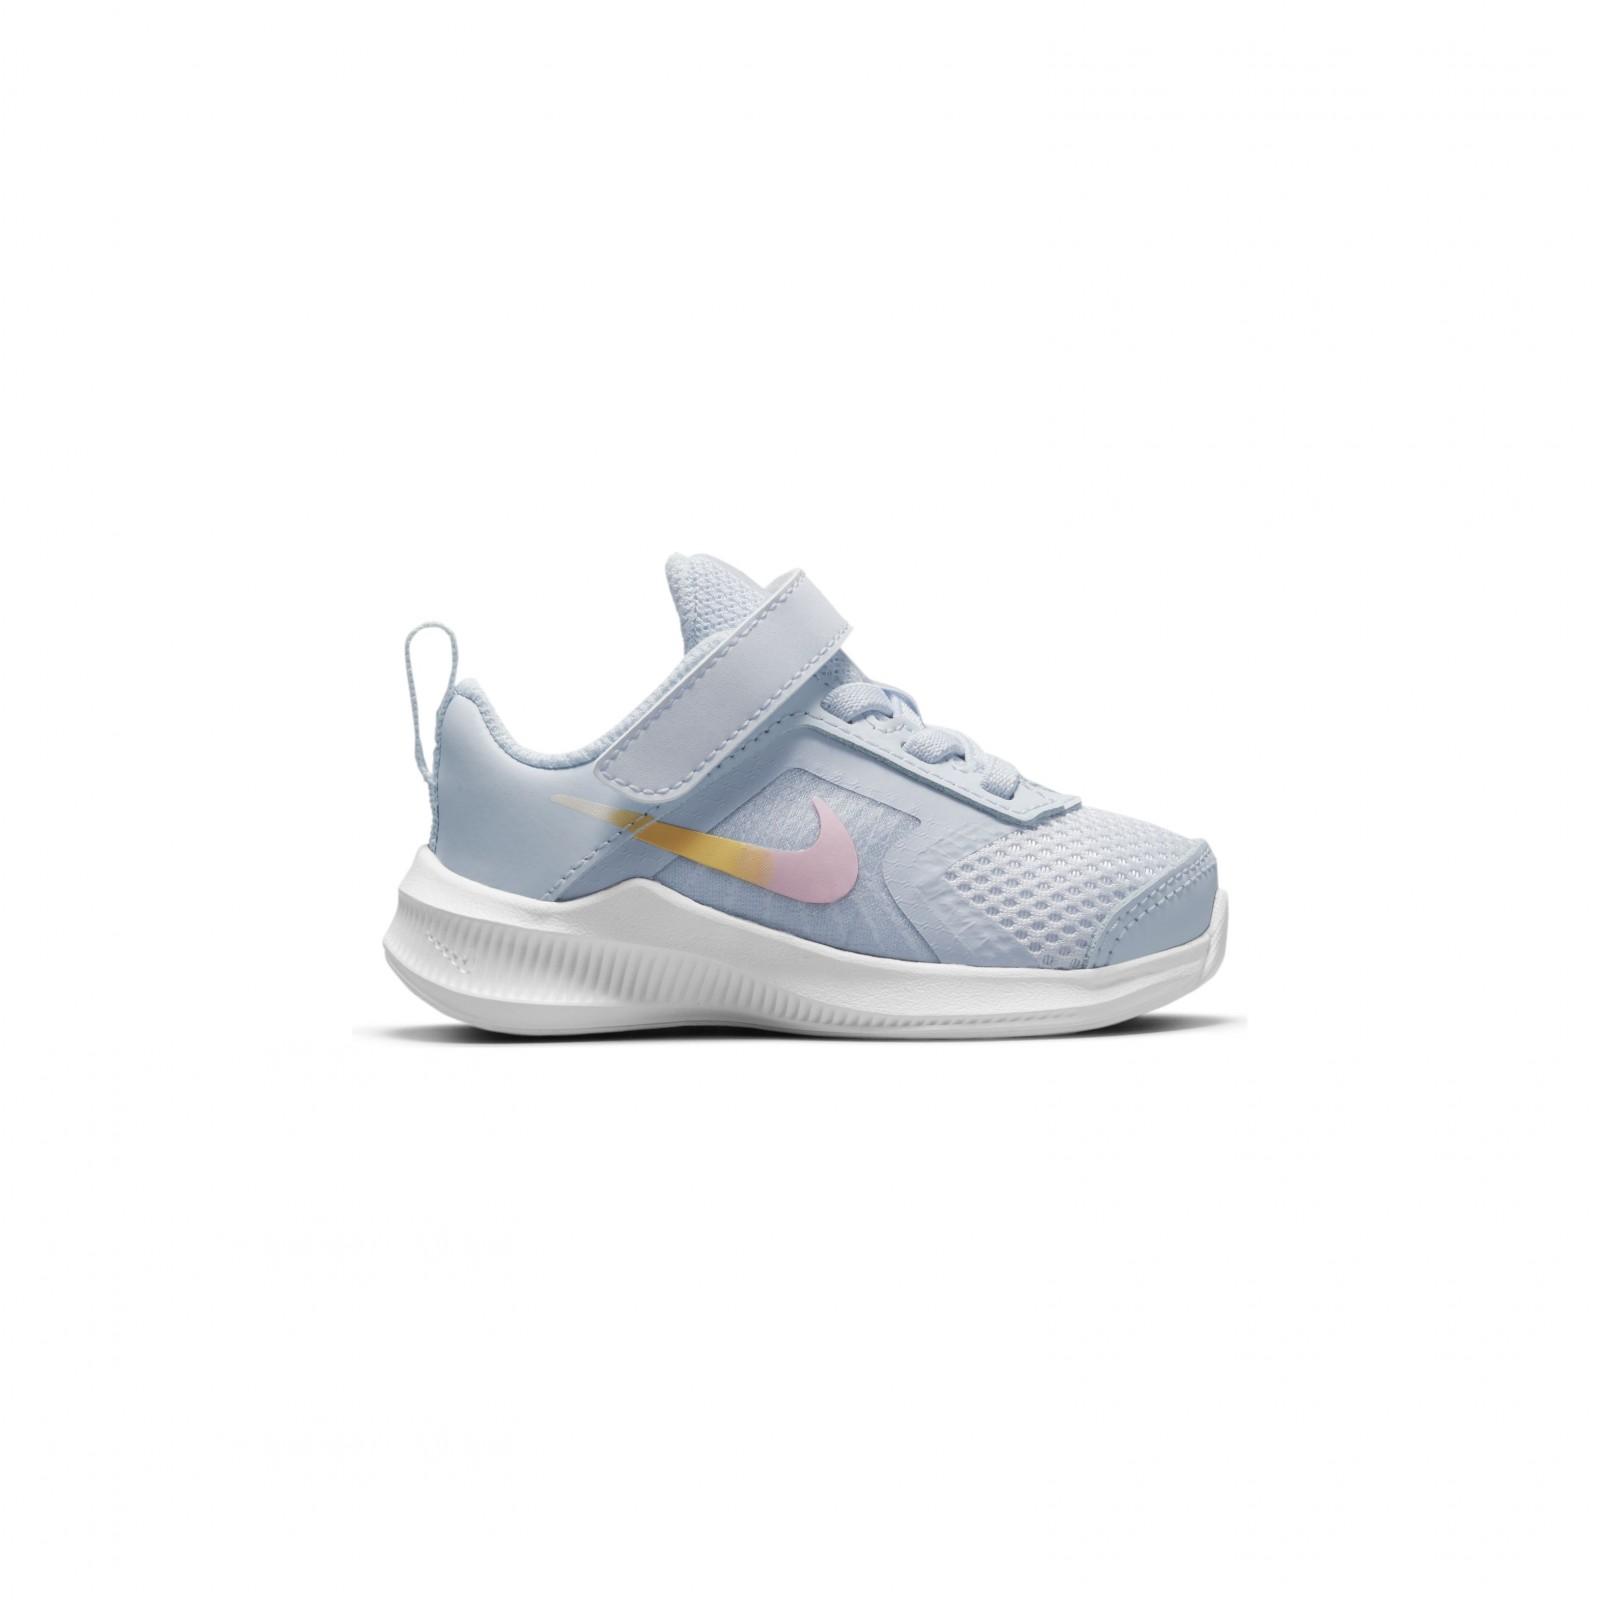 Nike Downshifter 11 SE FOOTBALL GREY/MULTI-COLOR-WHITE